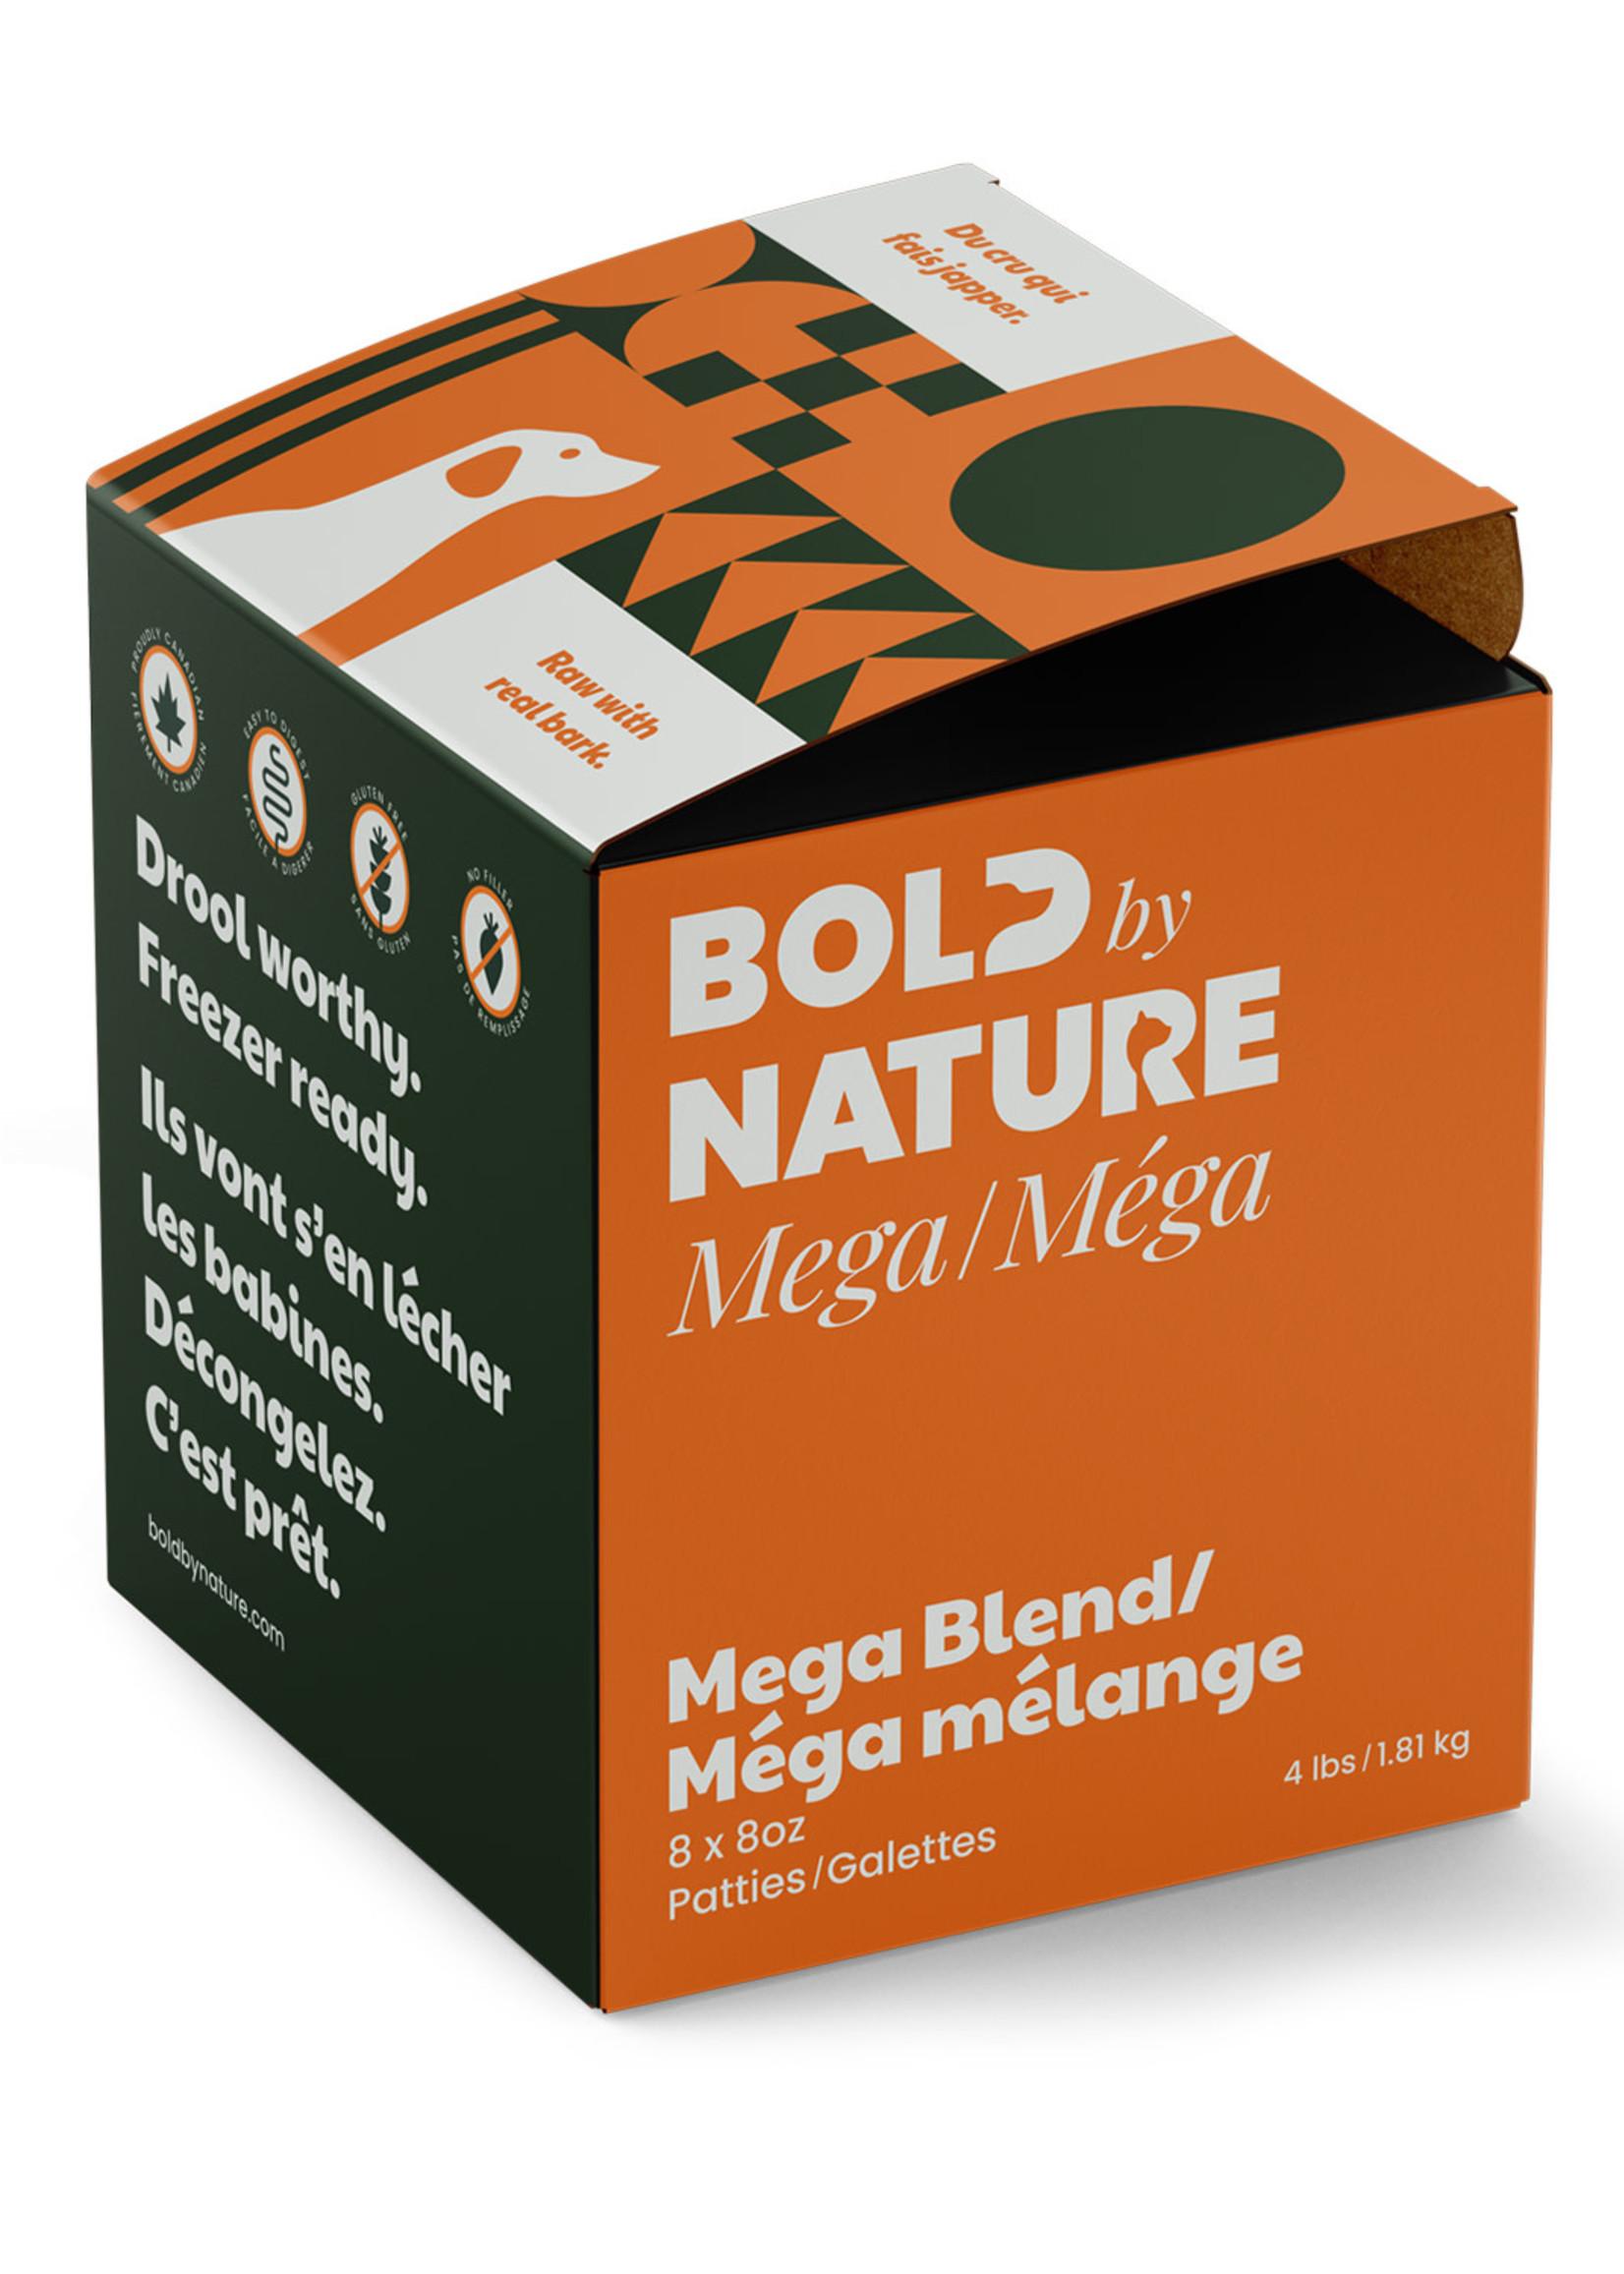 Mega Dog Raw Mega Dog Raw Mega Blend 4lbs